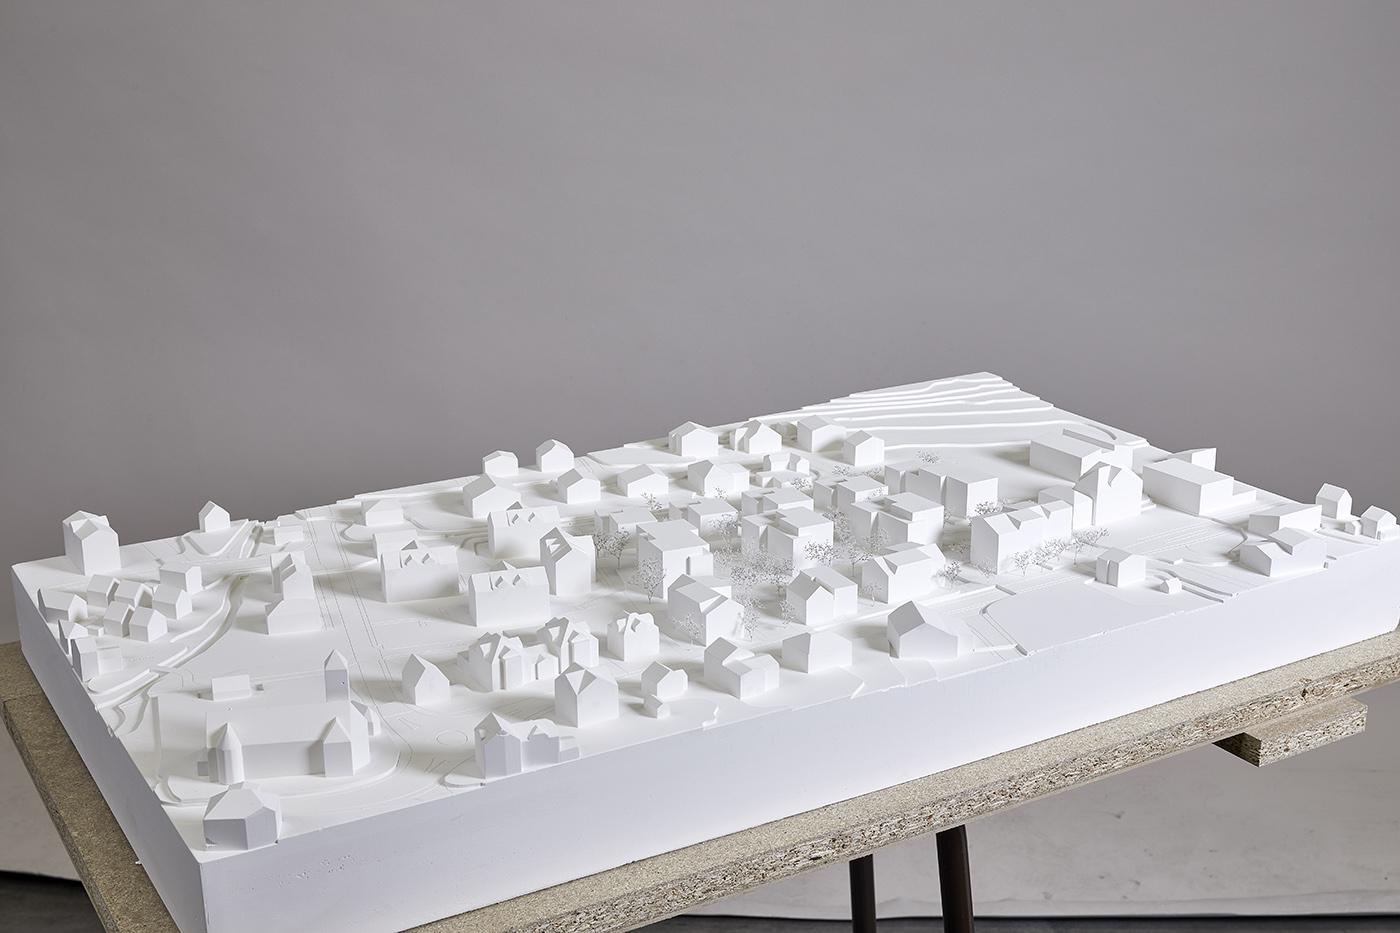 buan architekten – Studienauftrag Areal Schuetzenmatt Inwil – Modell – 4